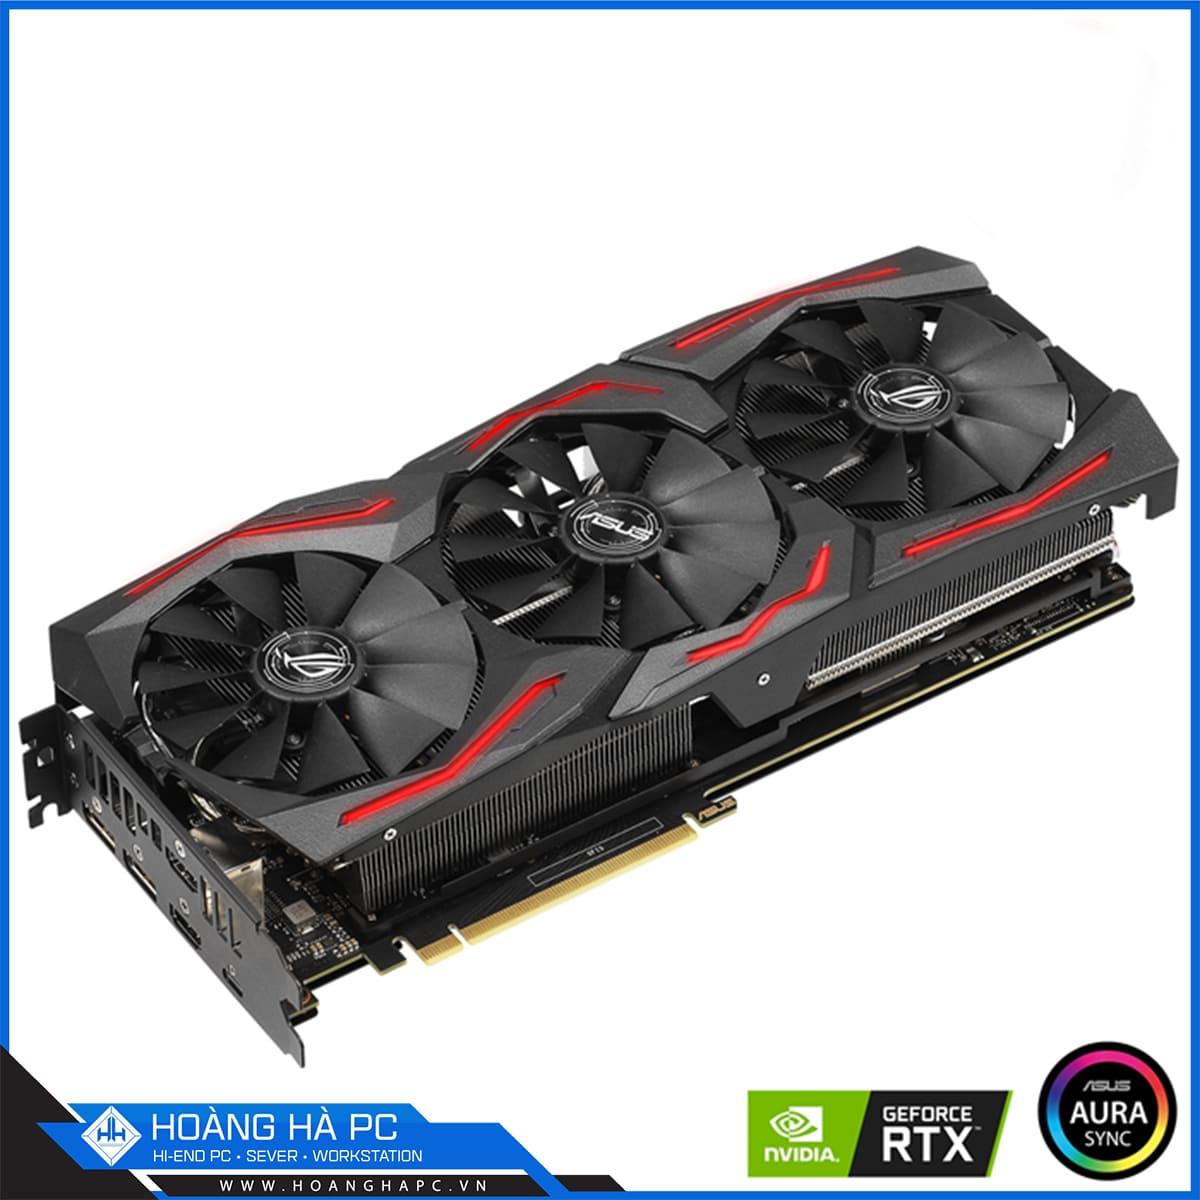 VGA Asus ROG Strix GeForce RTX 2060 Super EVO Gaming 8GB GDDR6